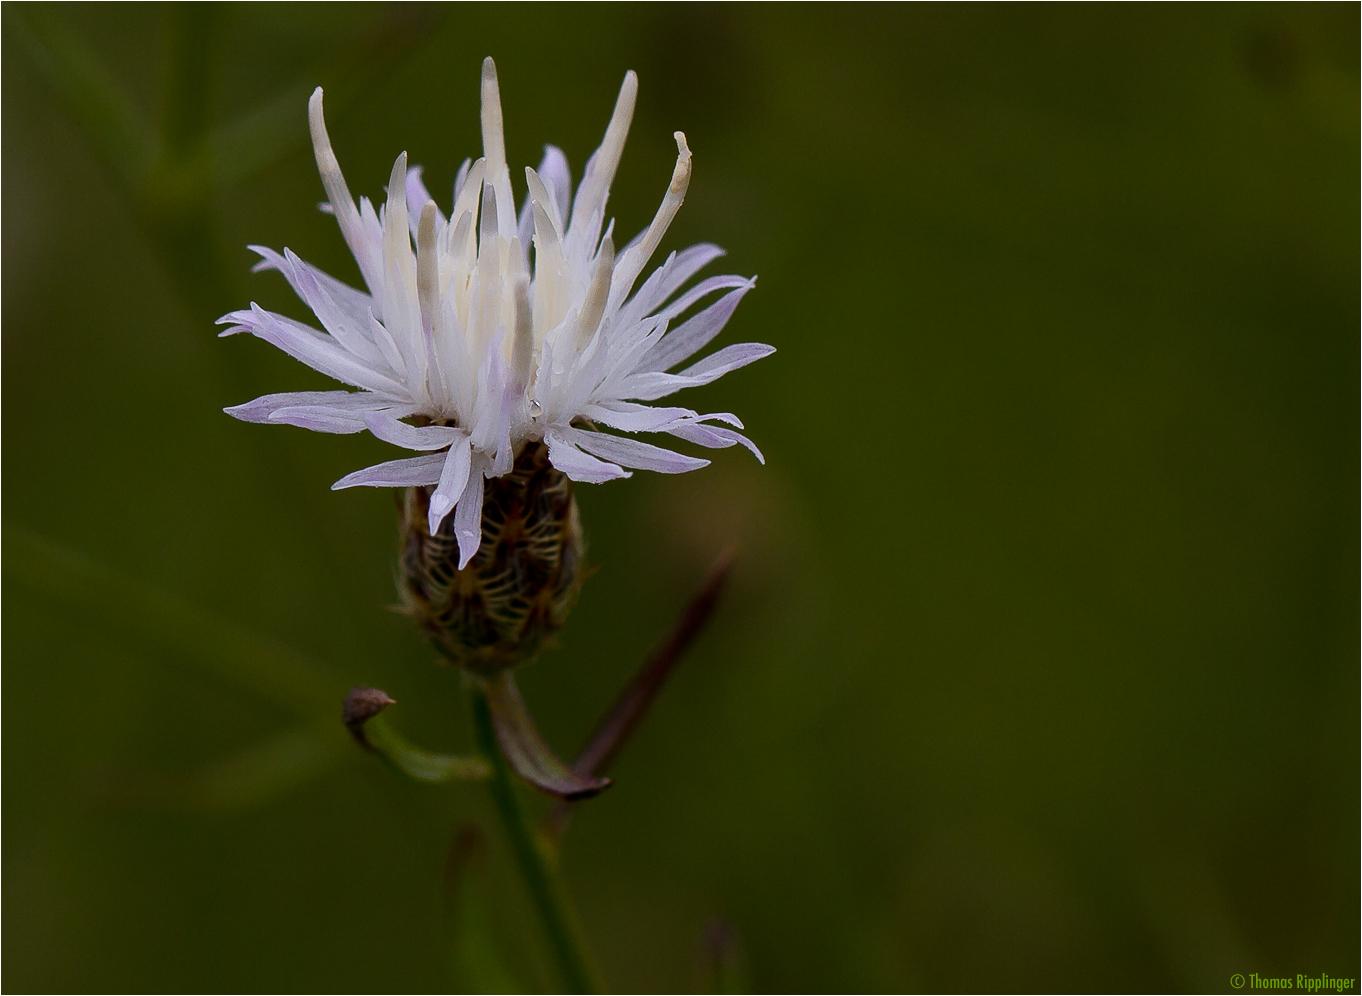 Sparrige Flockenblume (Centaurea diffusa)